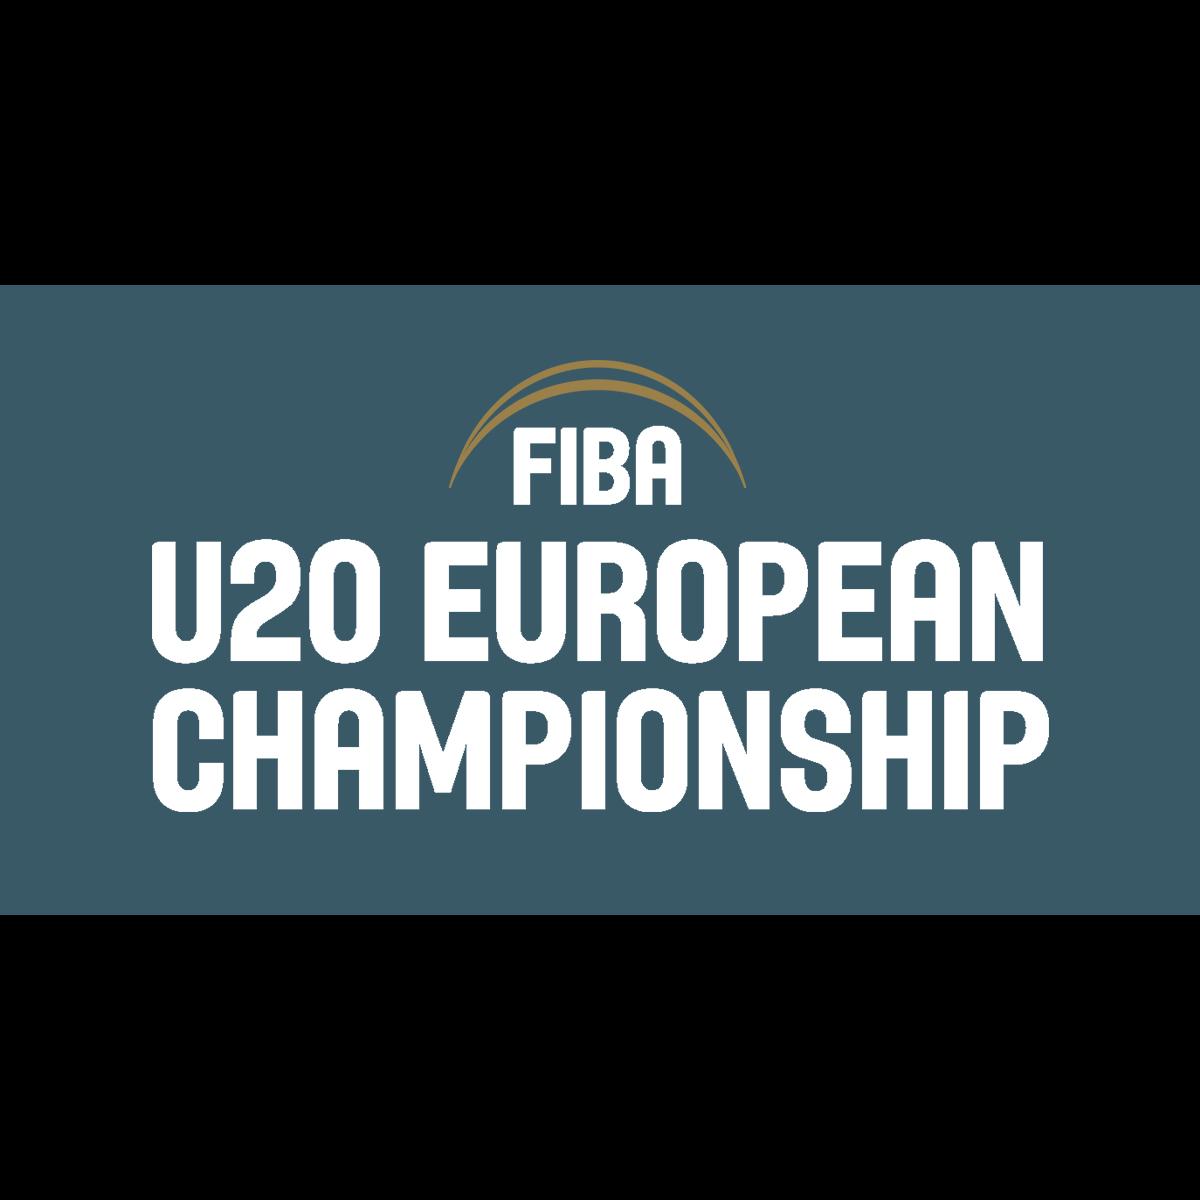 2016 FIBA U20 European Basketball Championship - Division B